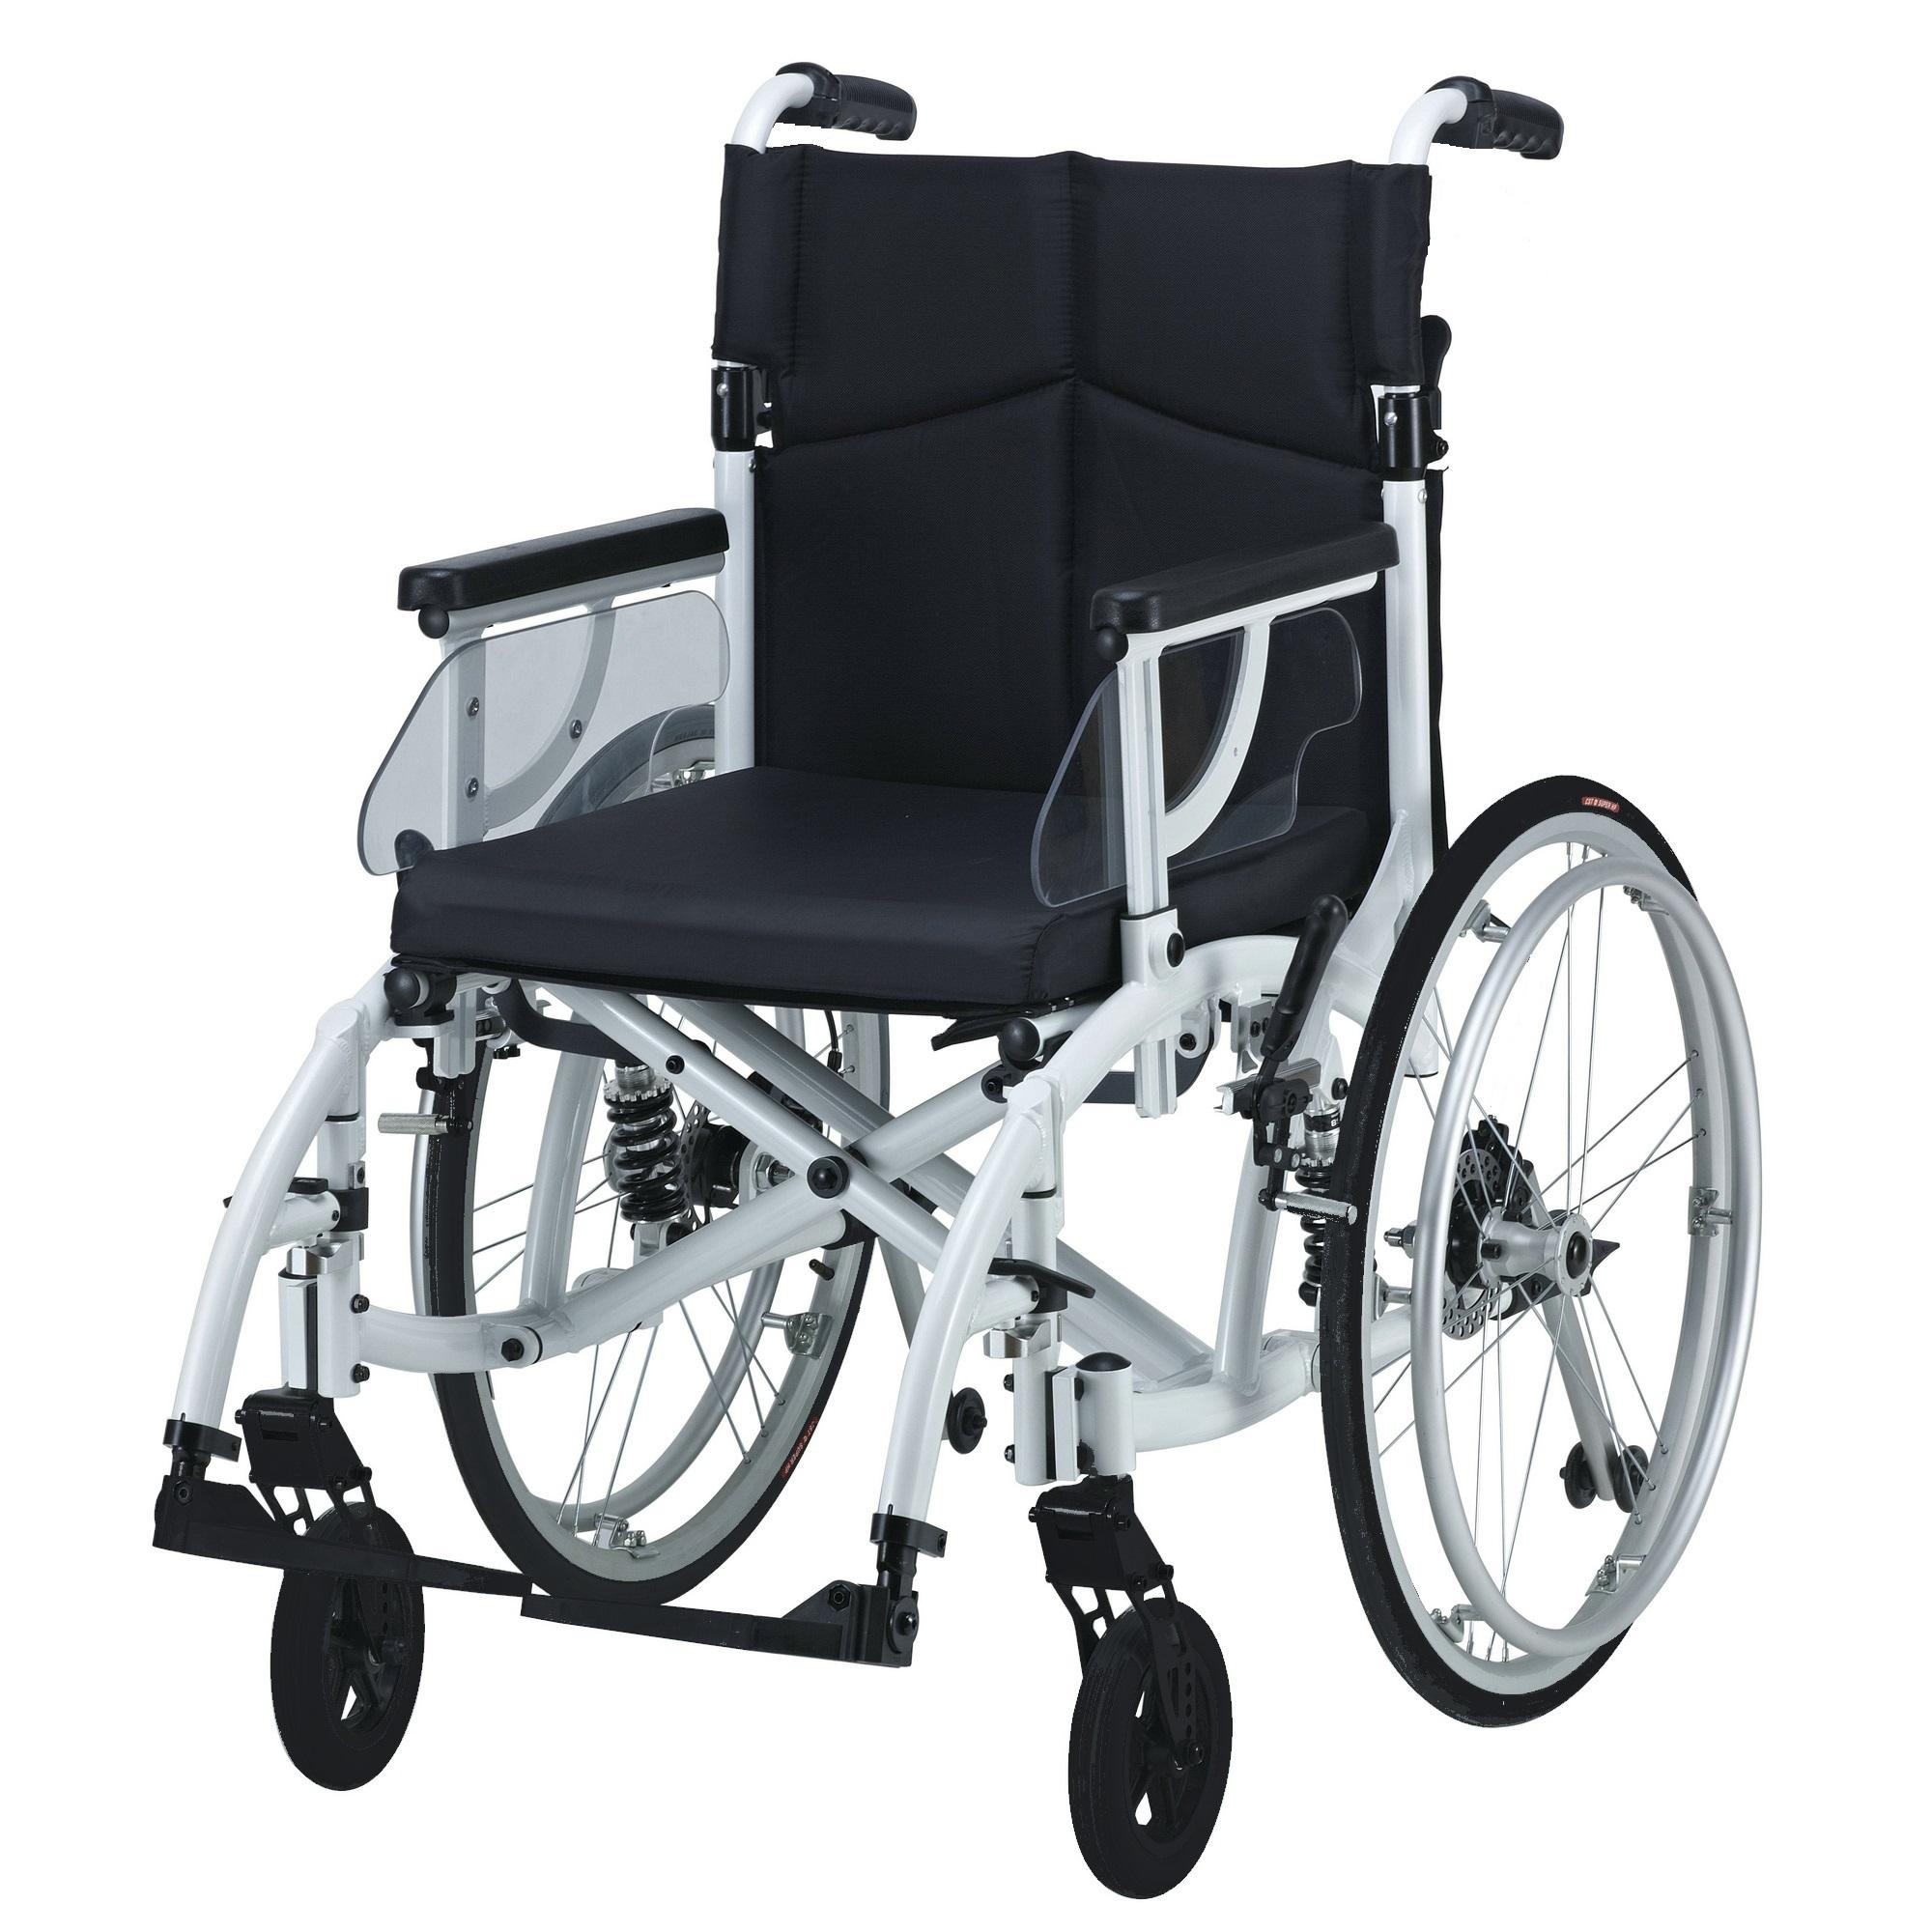 Suspension wheelchair EC Odyssey Elite Care Direct